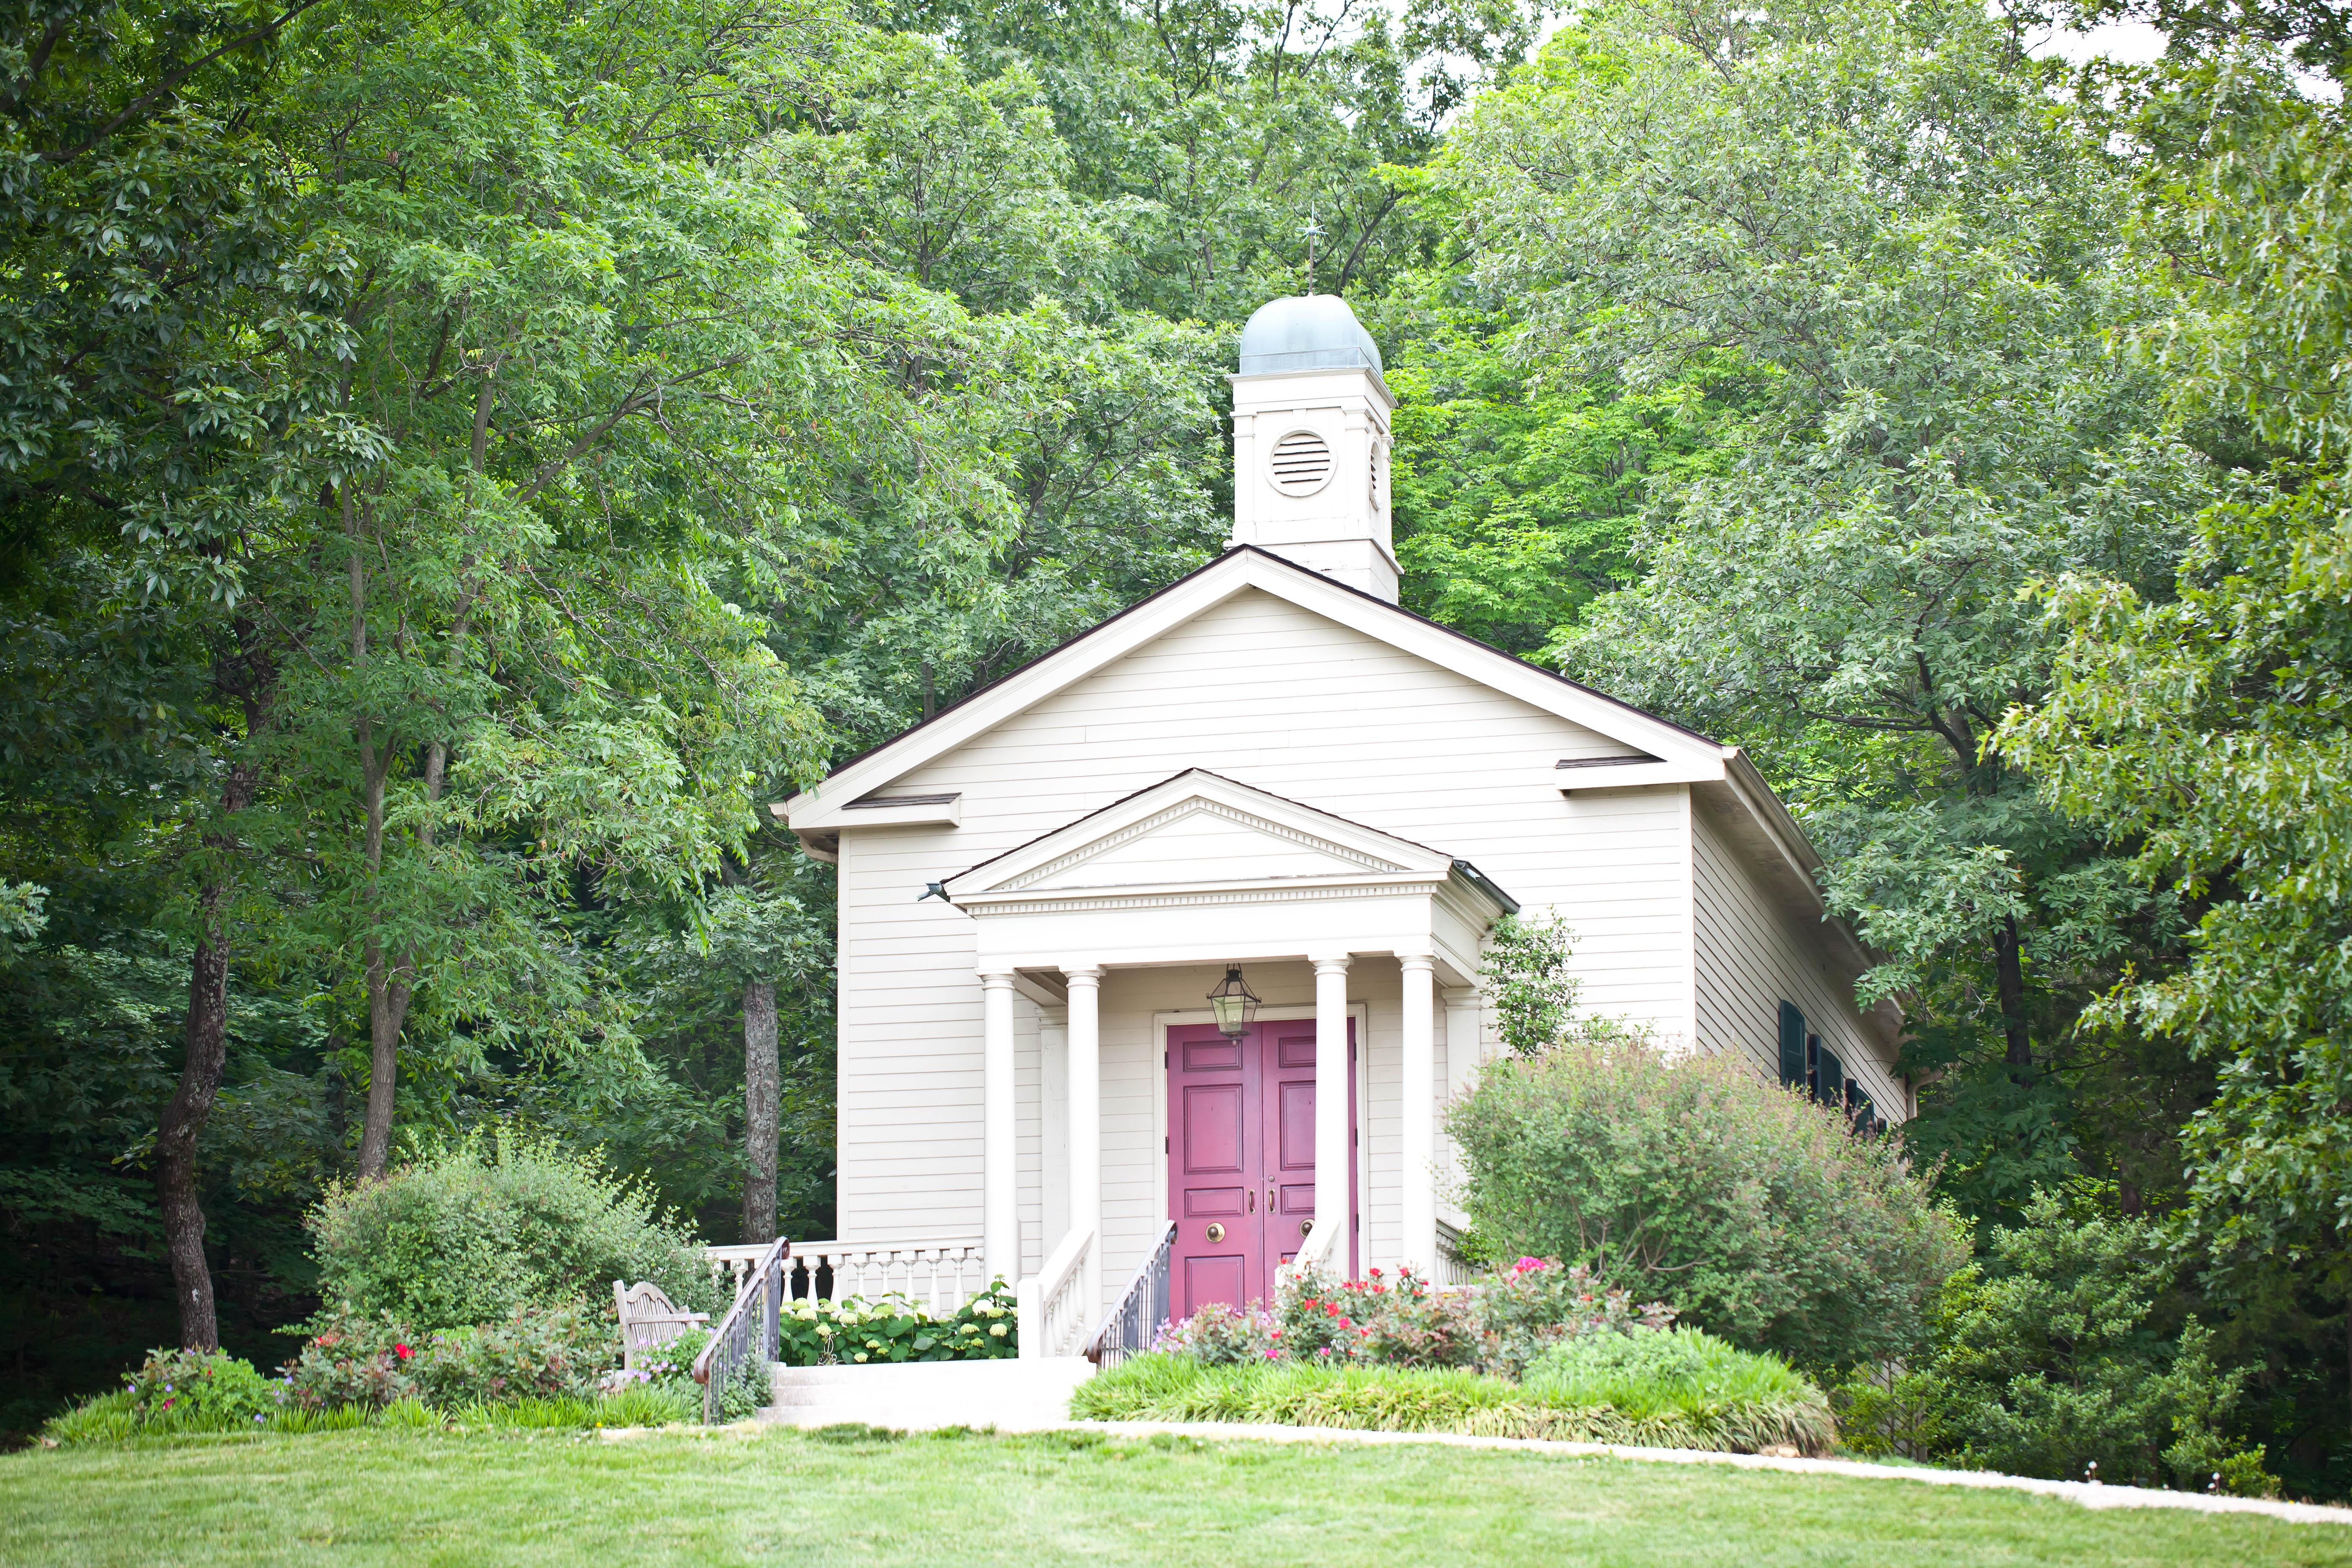 St Louis Wedding Chapel | Wedding Chapel Small Wedding Chapels In Missouri